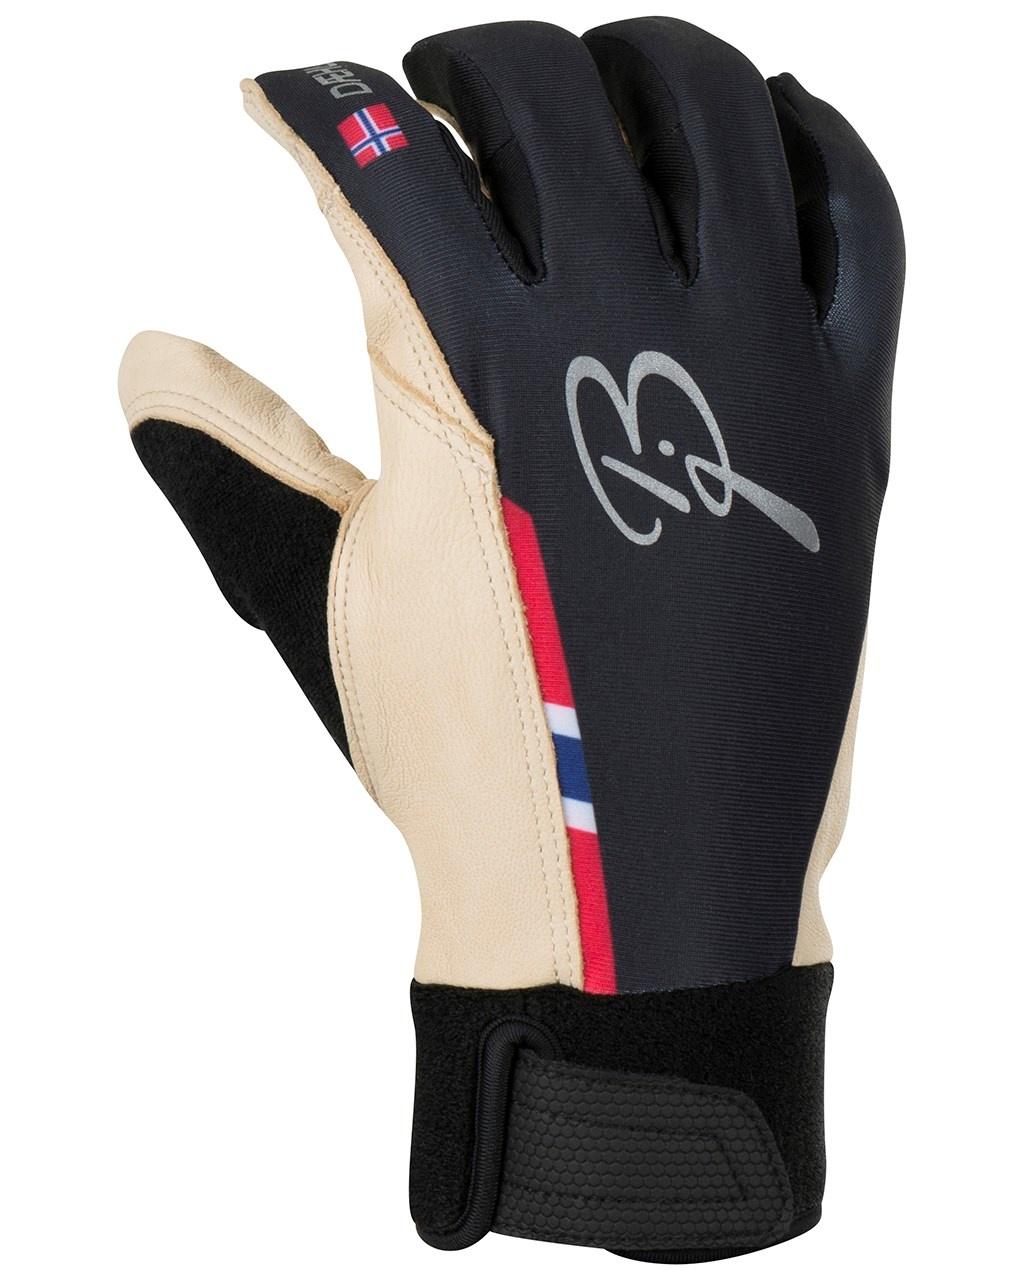 Bjorn Daehlie Bjorn Daehlie Race Glove XS